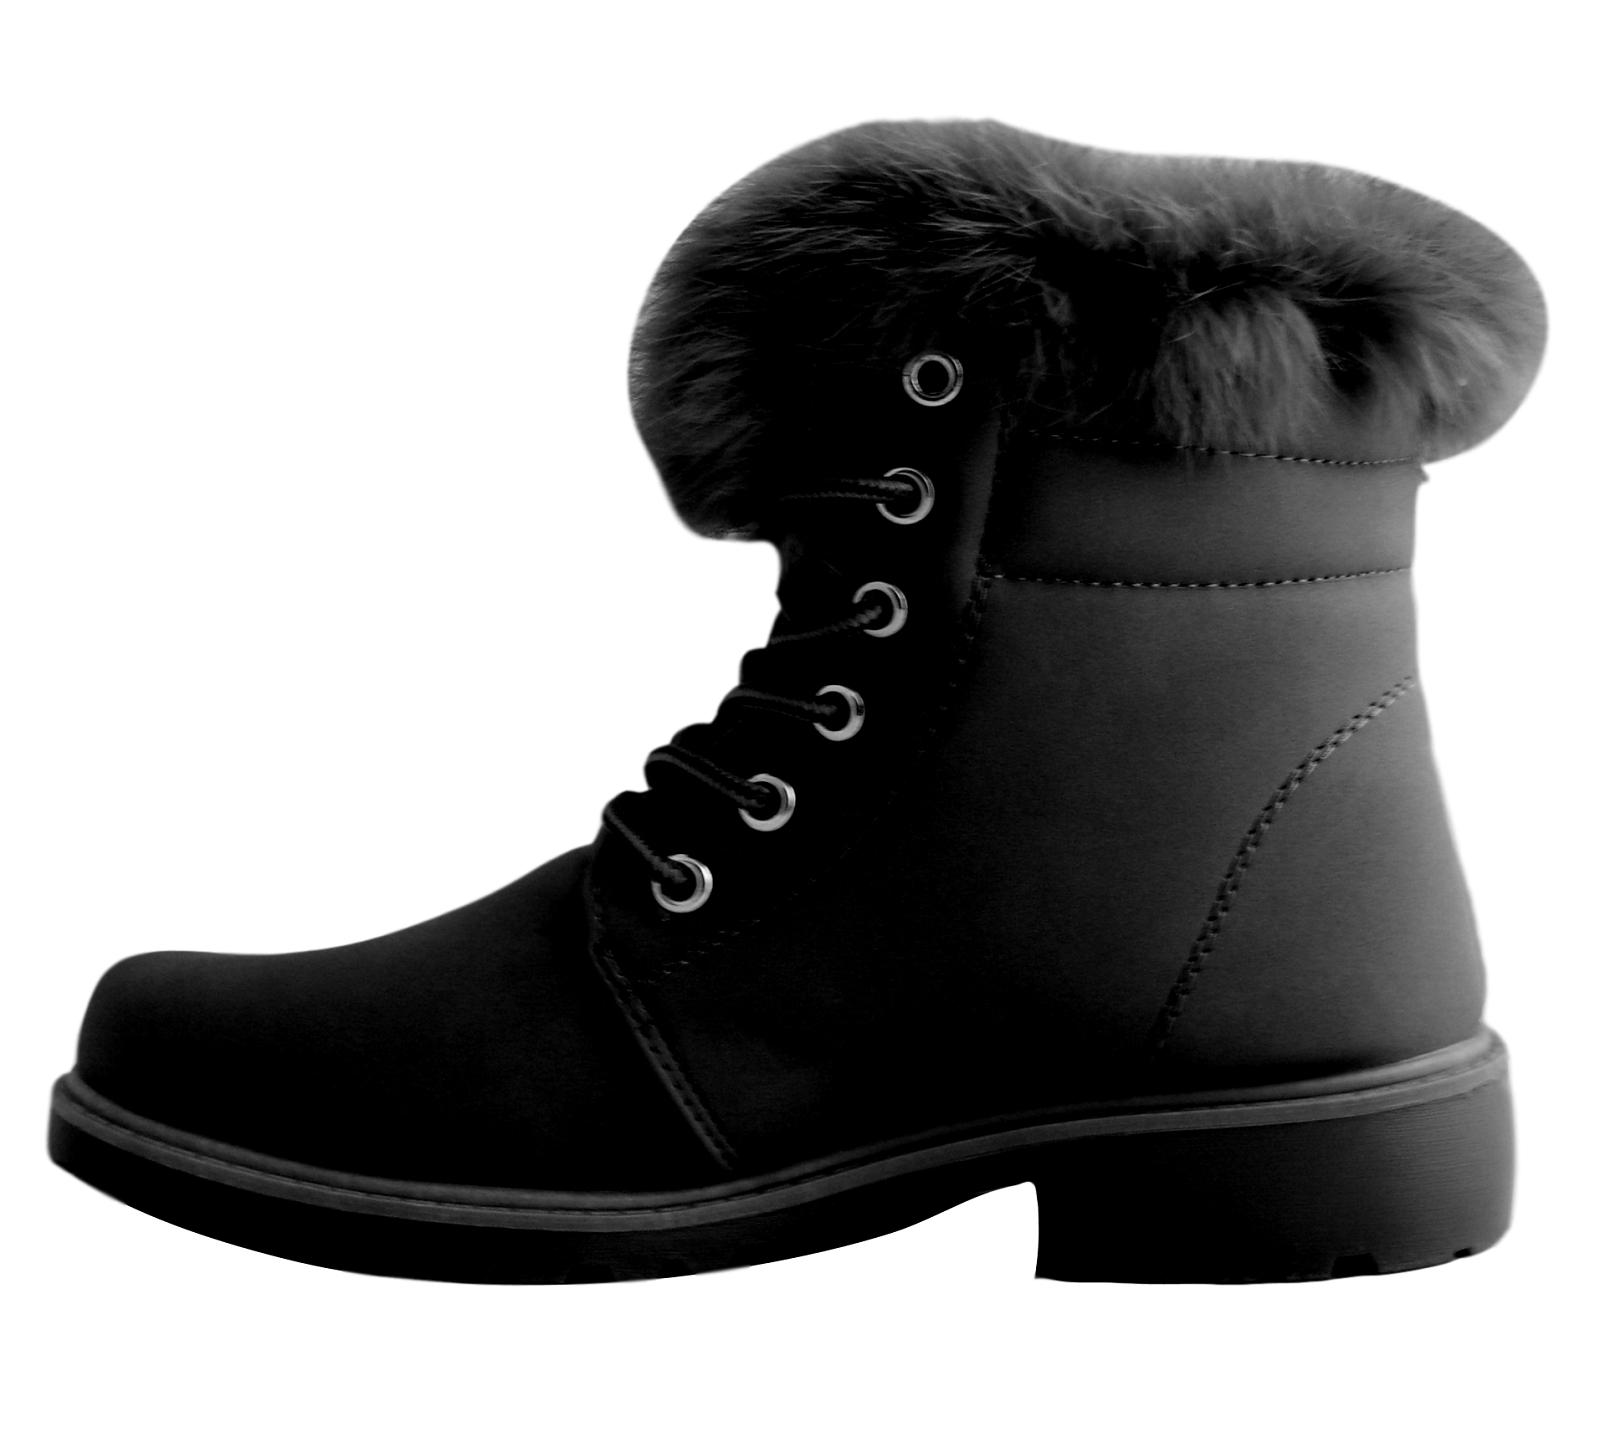 Scarpe-Donna-Invernali-Stivaletti-Pelle-Stivali-Imbottiti-Anfibi-Caldi-Scarponi miniatura 13